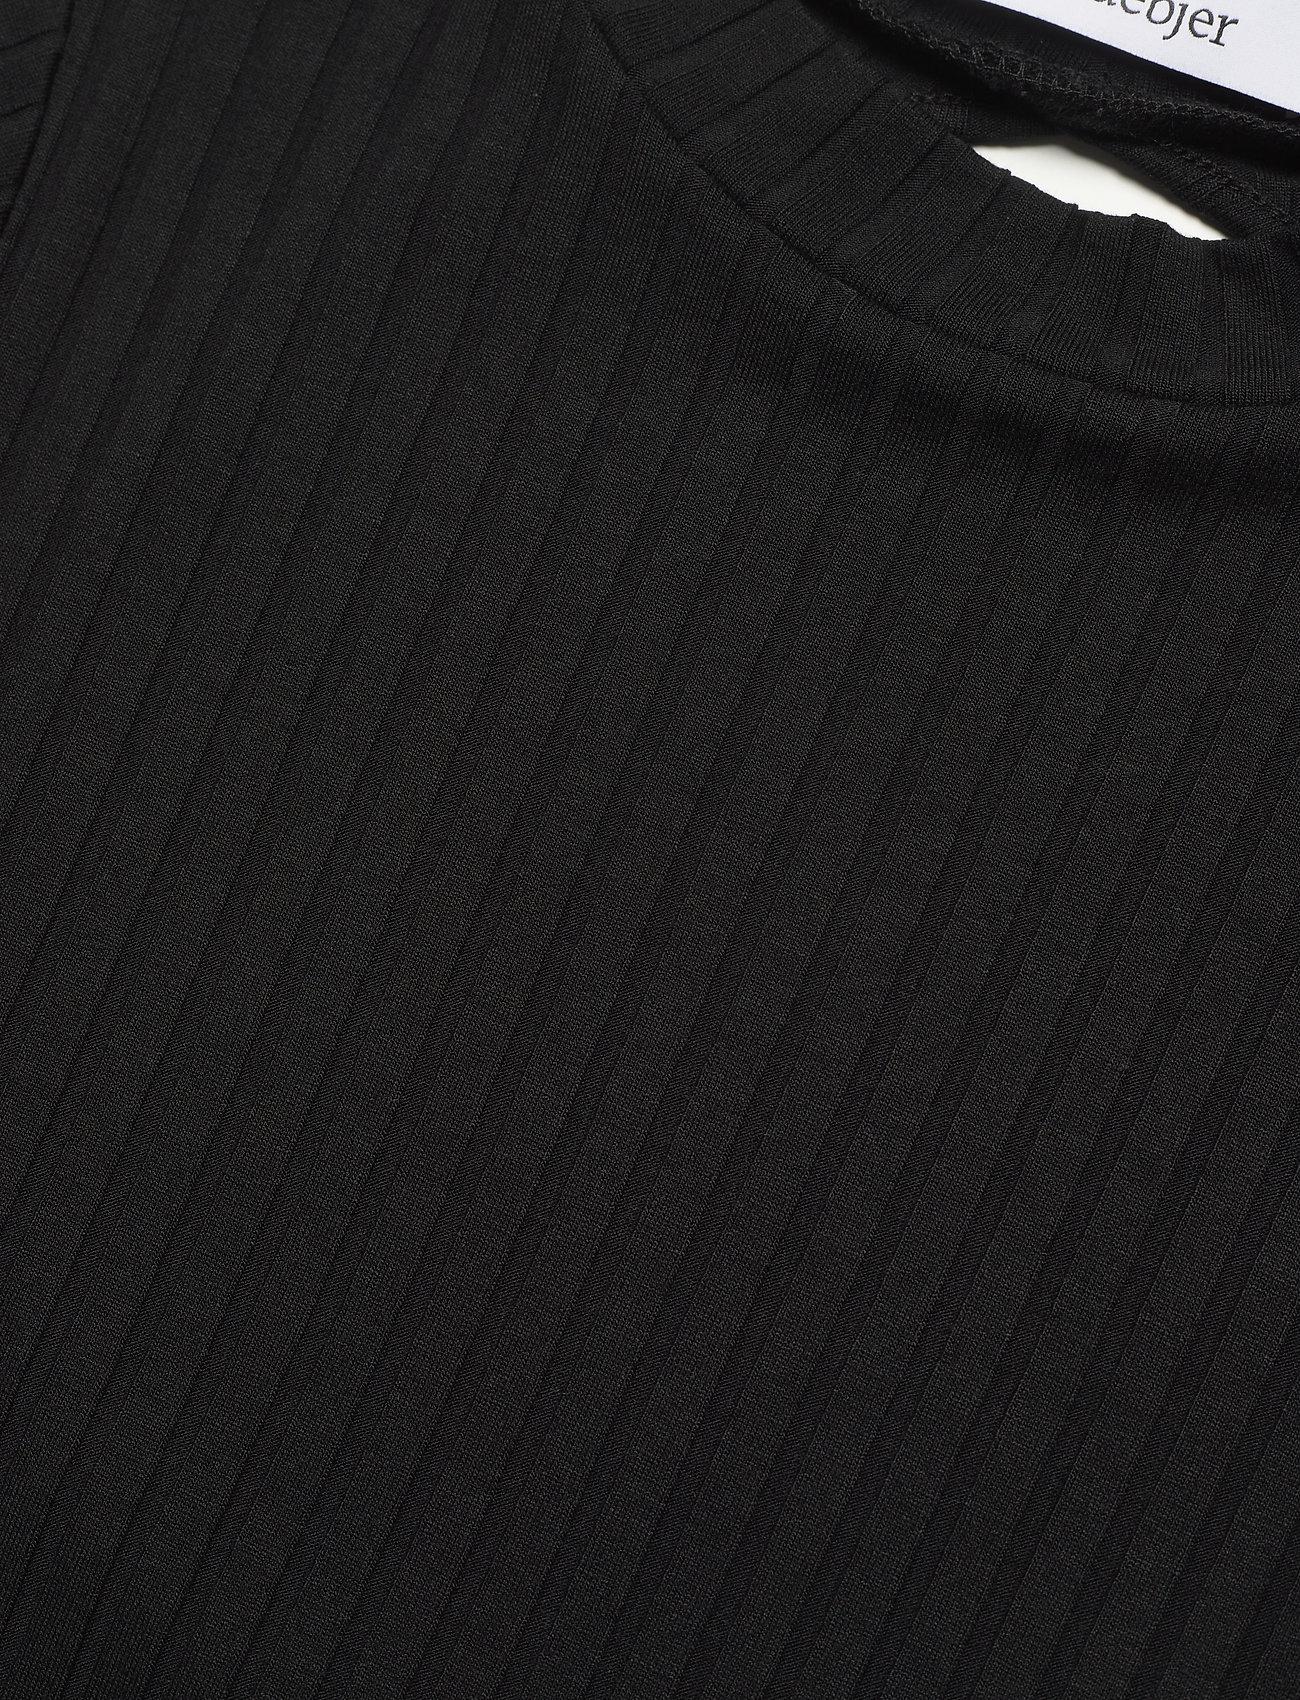 RODEBJER - RODEBJER KHRYSTYNA - strikkede toppe - black - 1